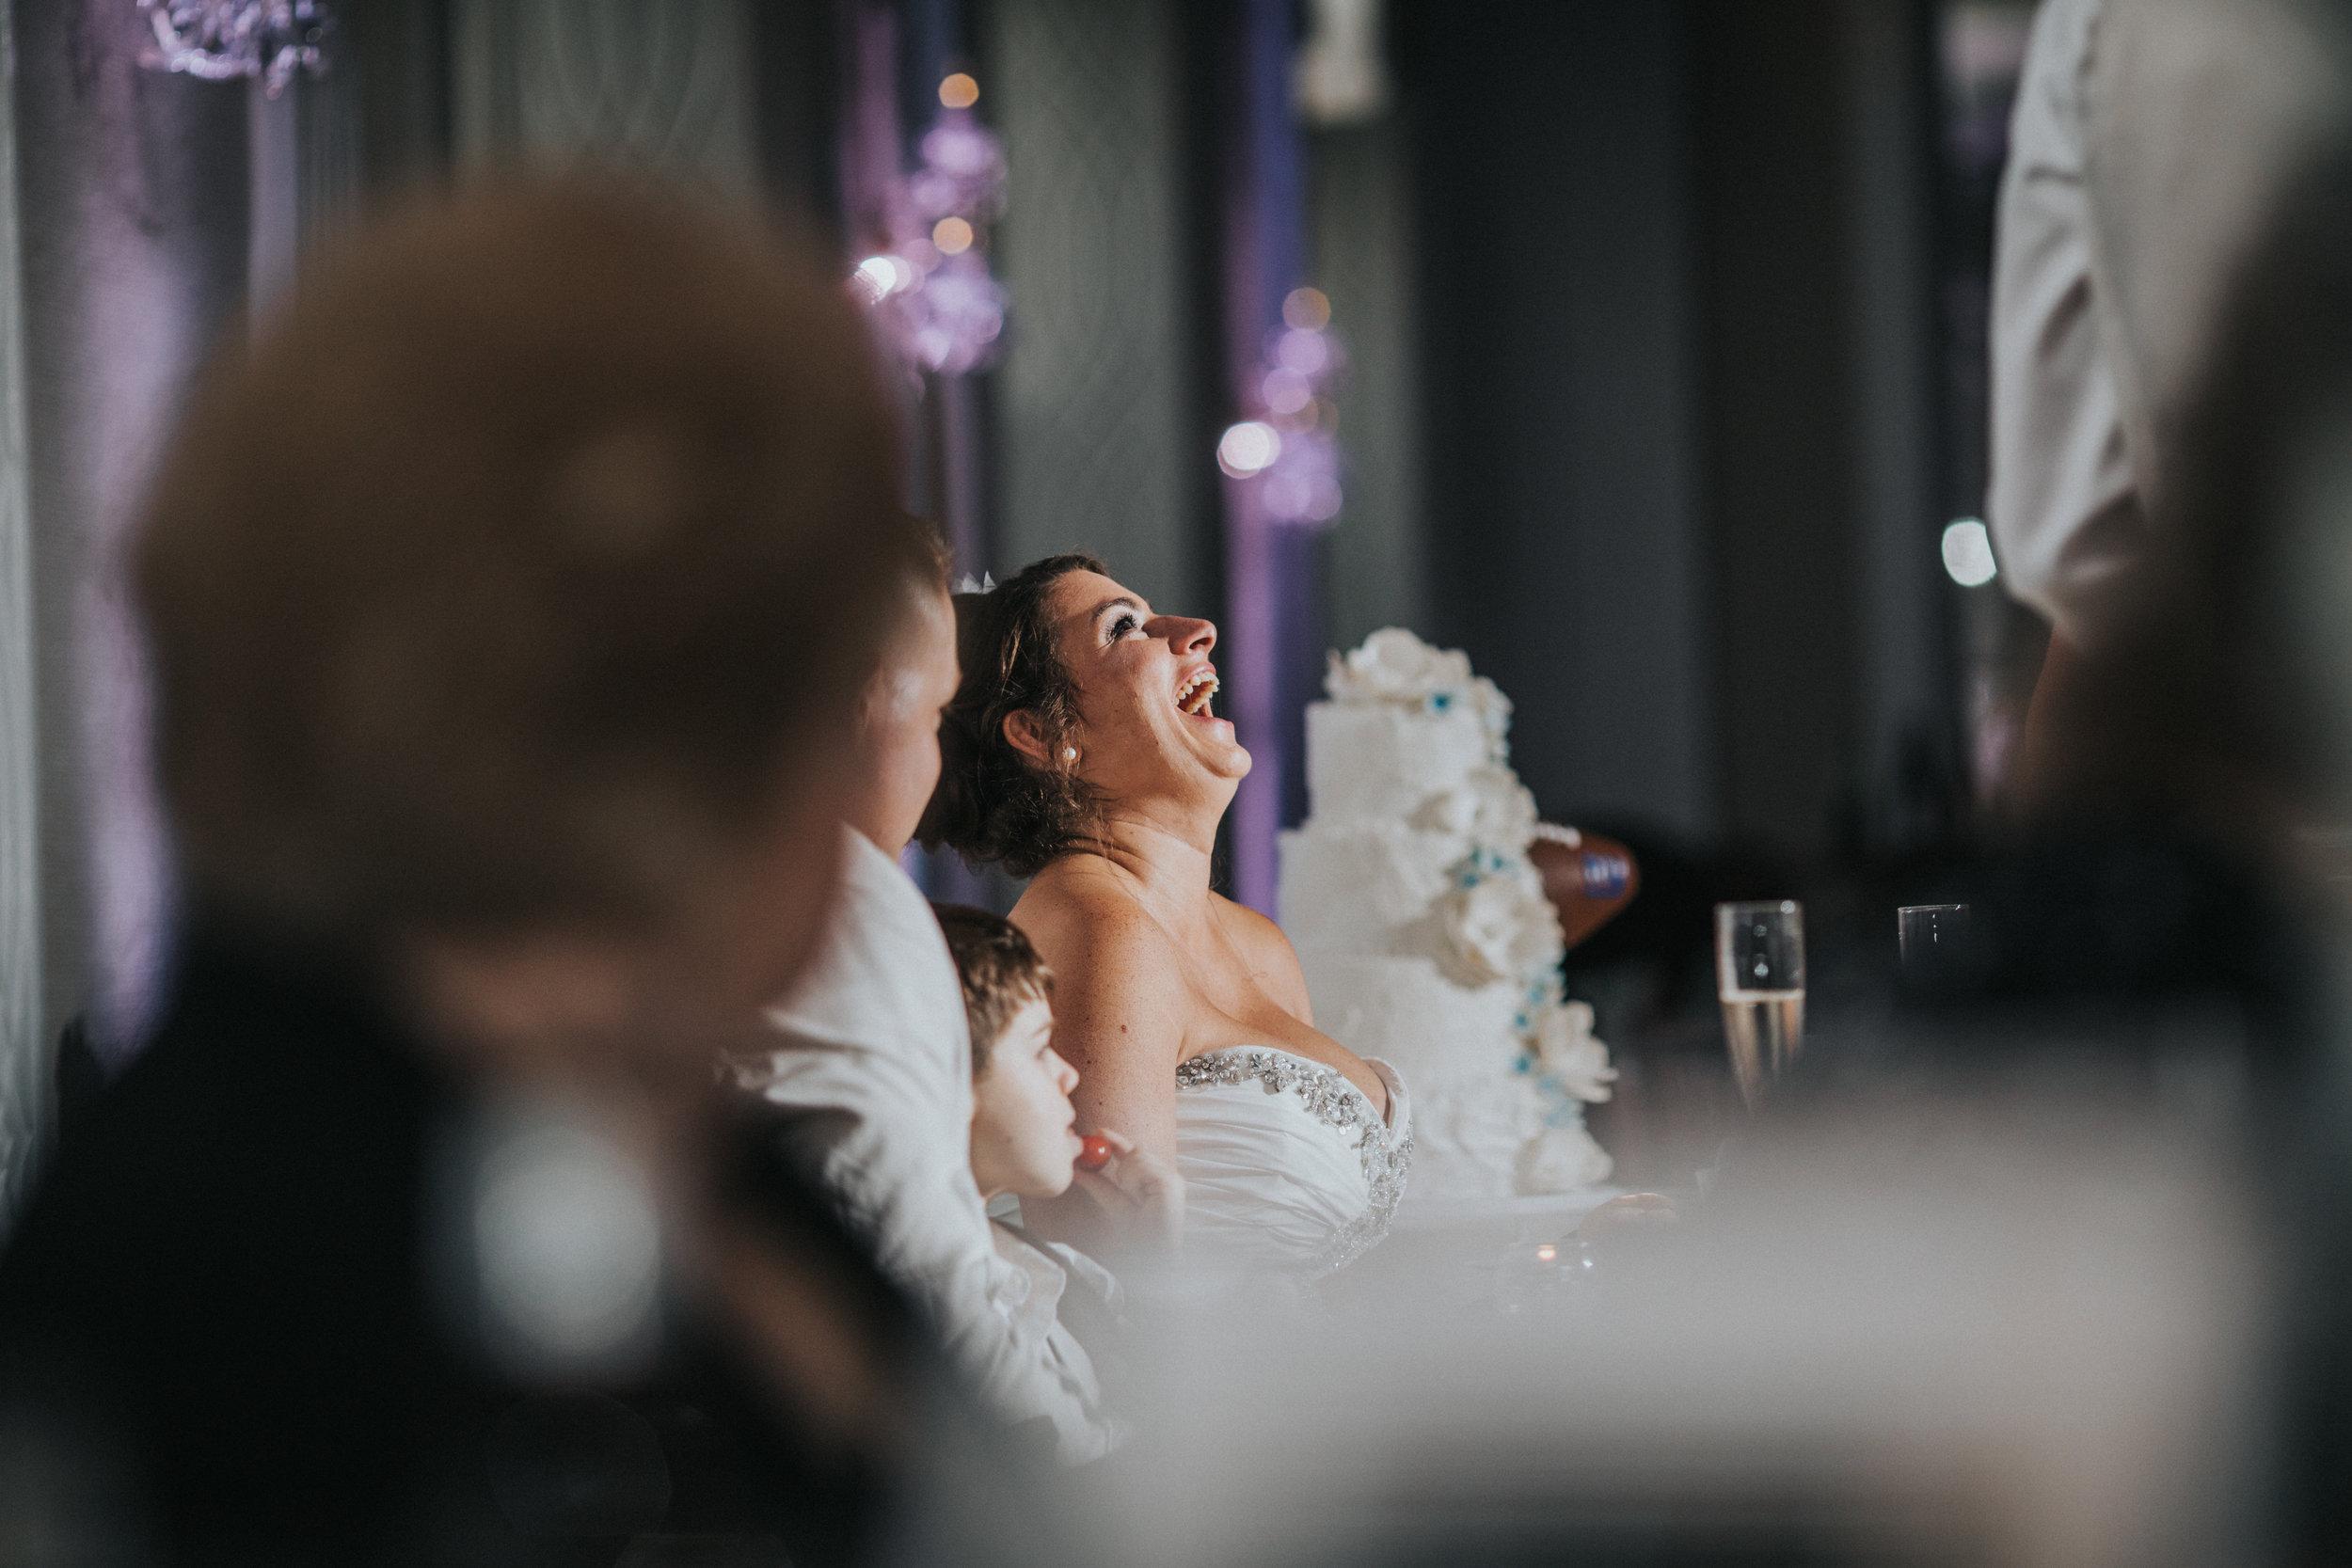 JennaLynnPhotography-NJWeddingPhotographer-Wedding-TheBerkeley-AsburyPark-Allison&Michael-Reception-47.jpg